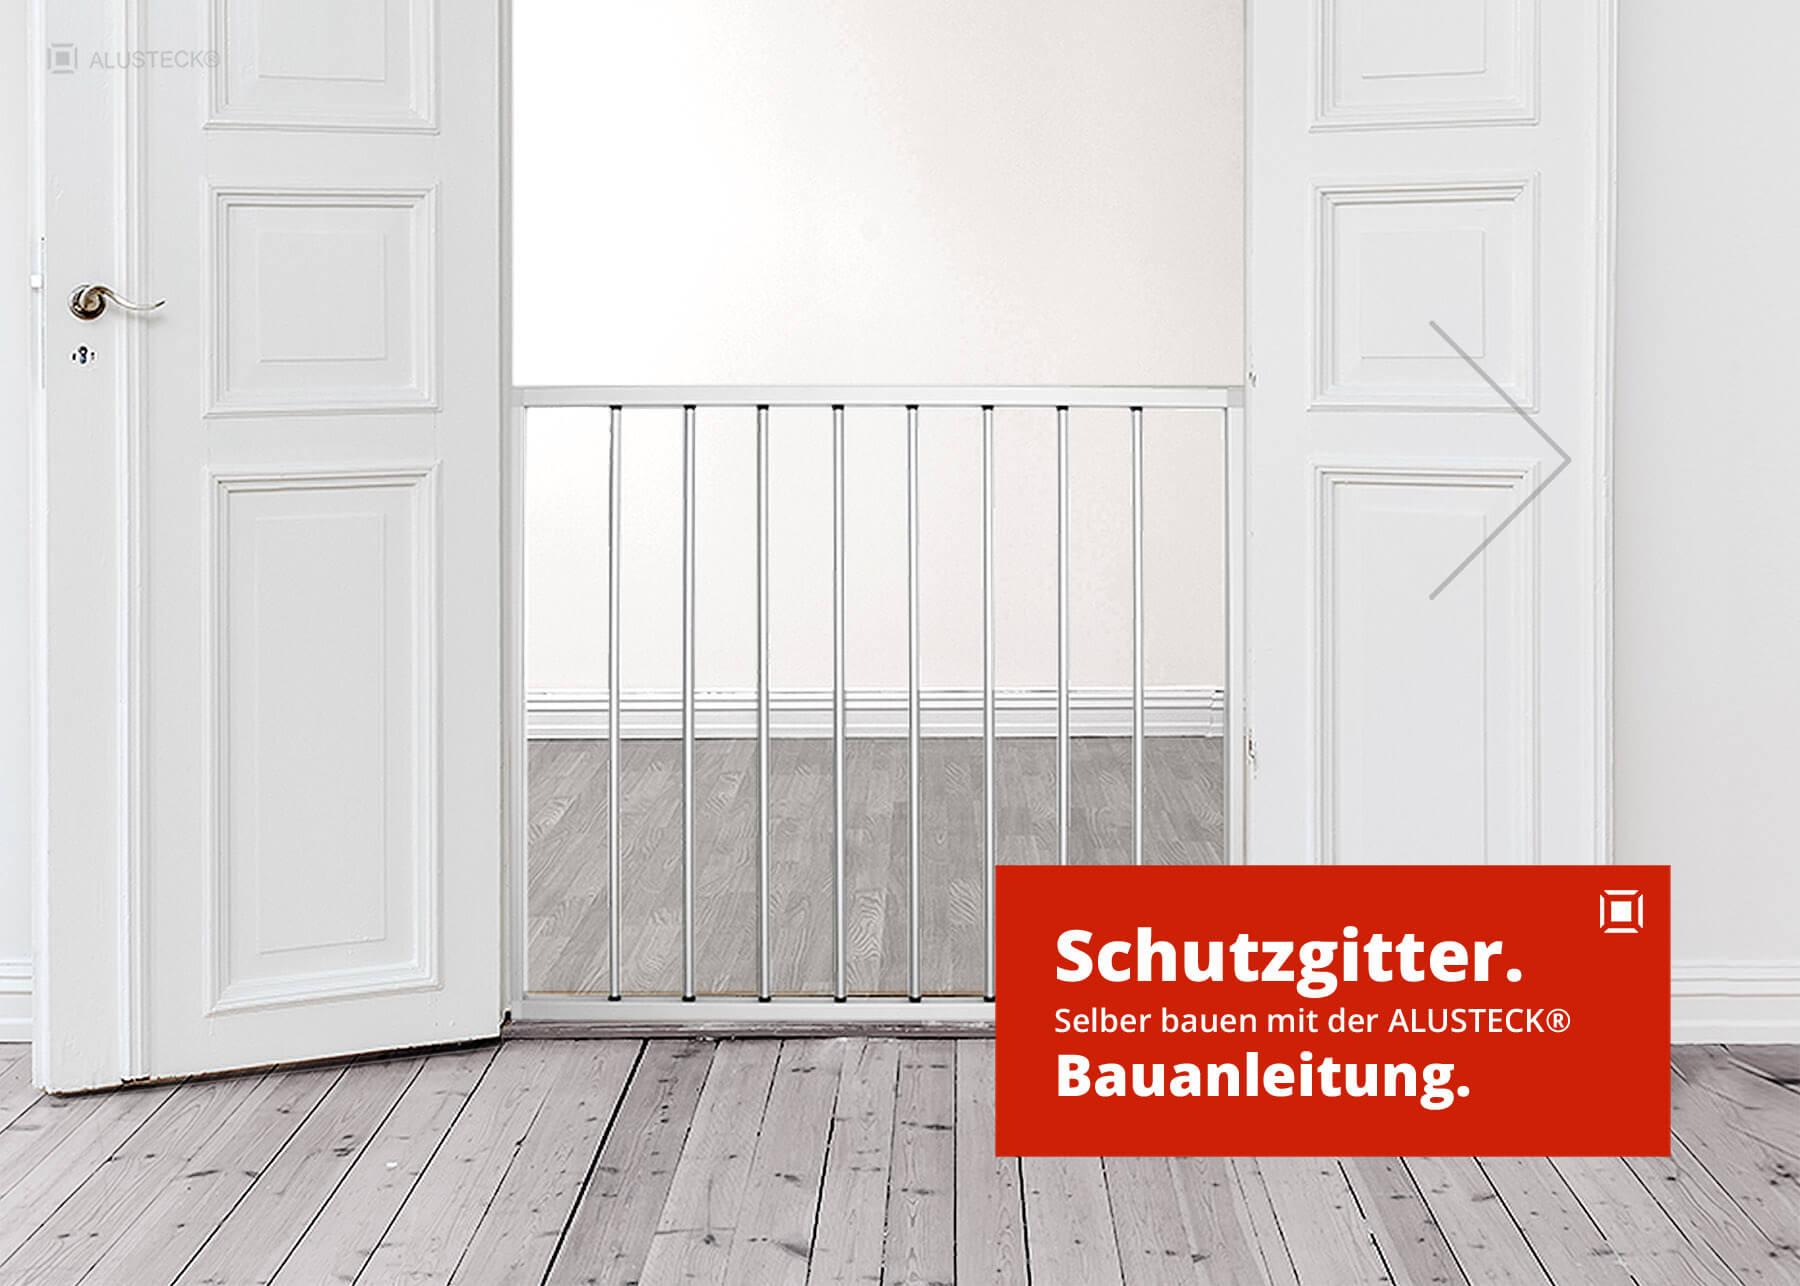 schutzgitter gitterst be alusteck schutzgitter system. Black Bedroom Furniture Sets. Home Design Ideas